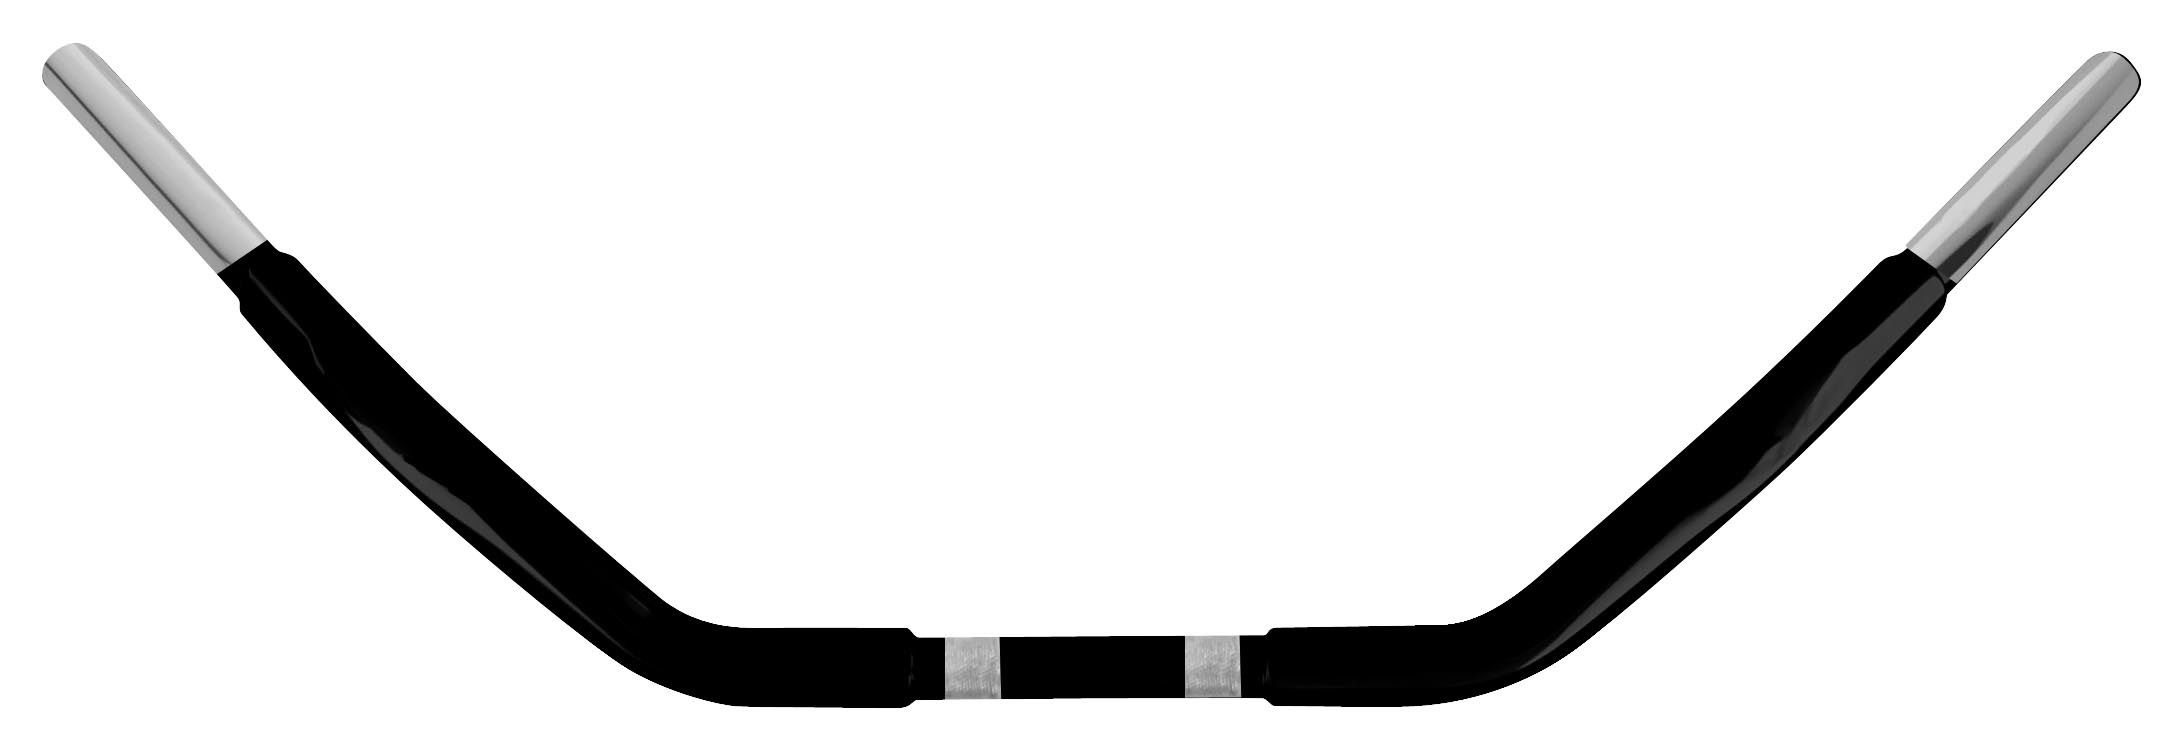 Mobius strip applications